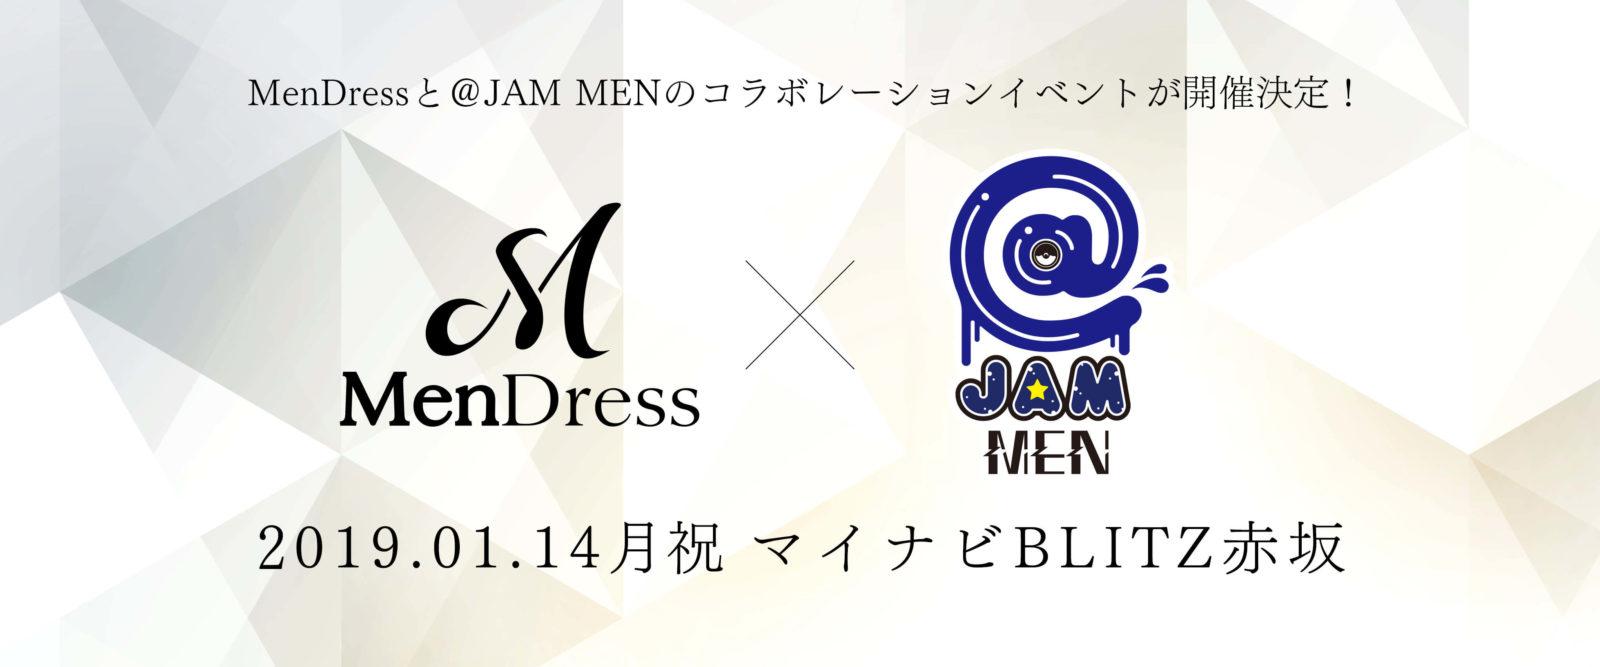 MenDress×@JAM MEN 2019新春Special 開催&第1弾出演者決定